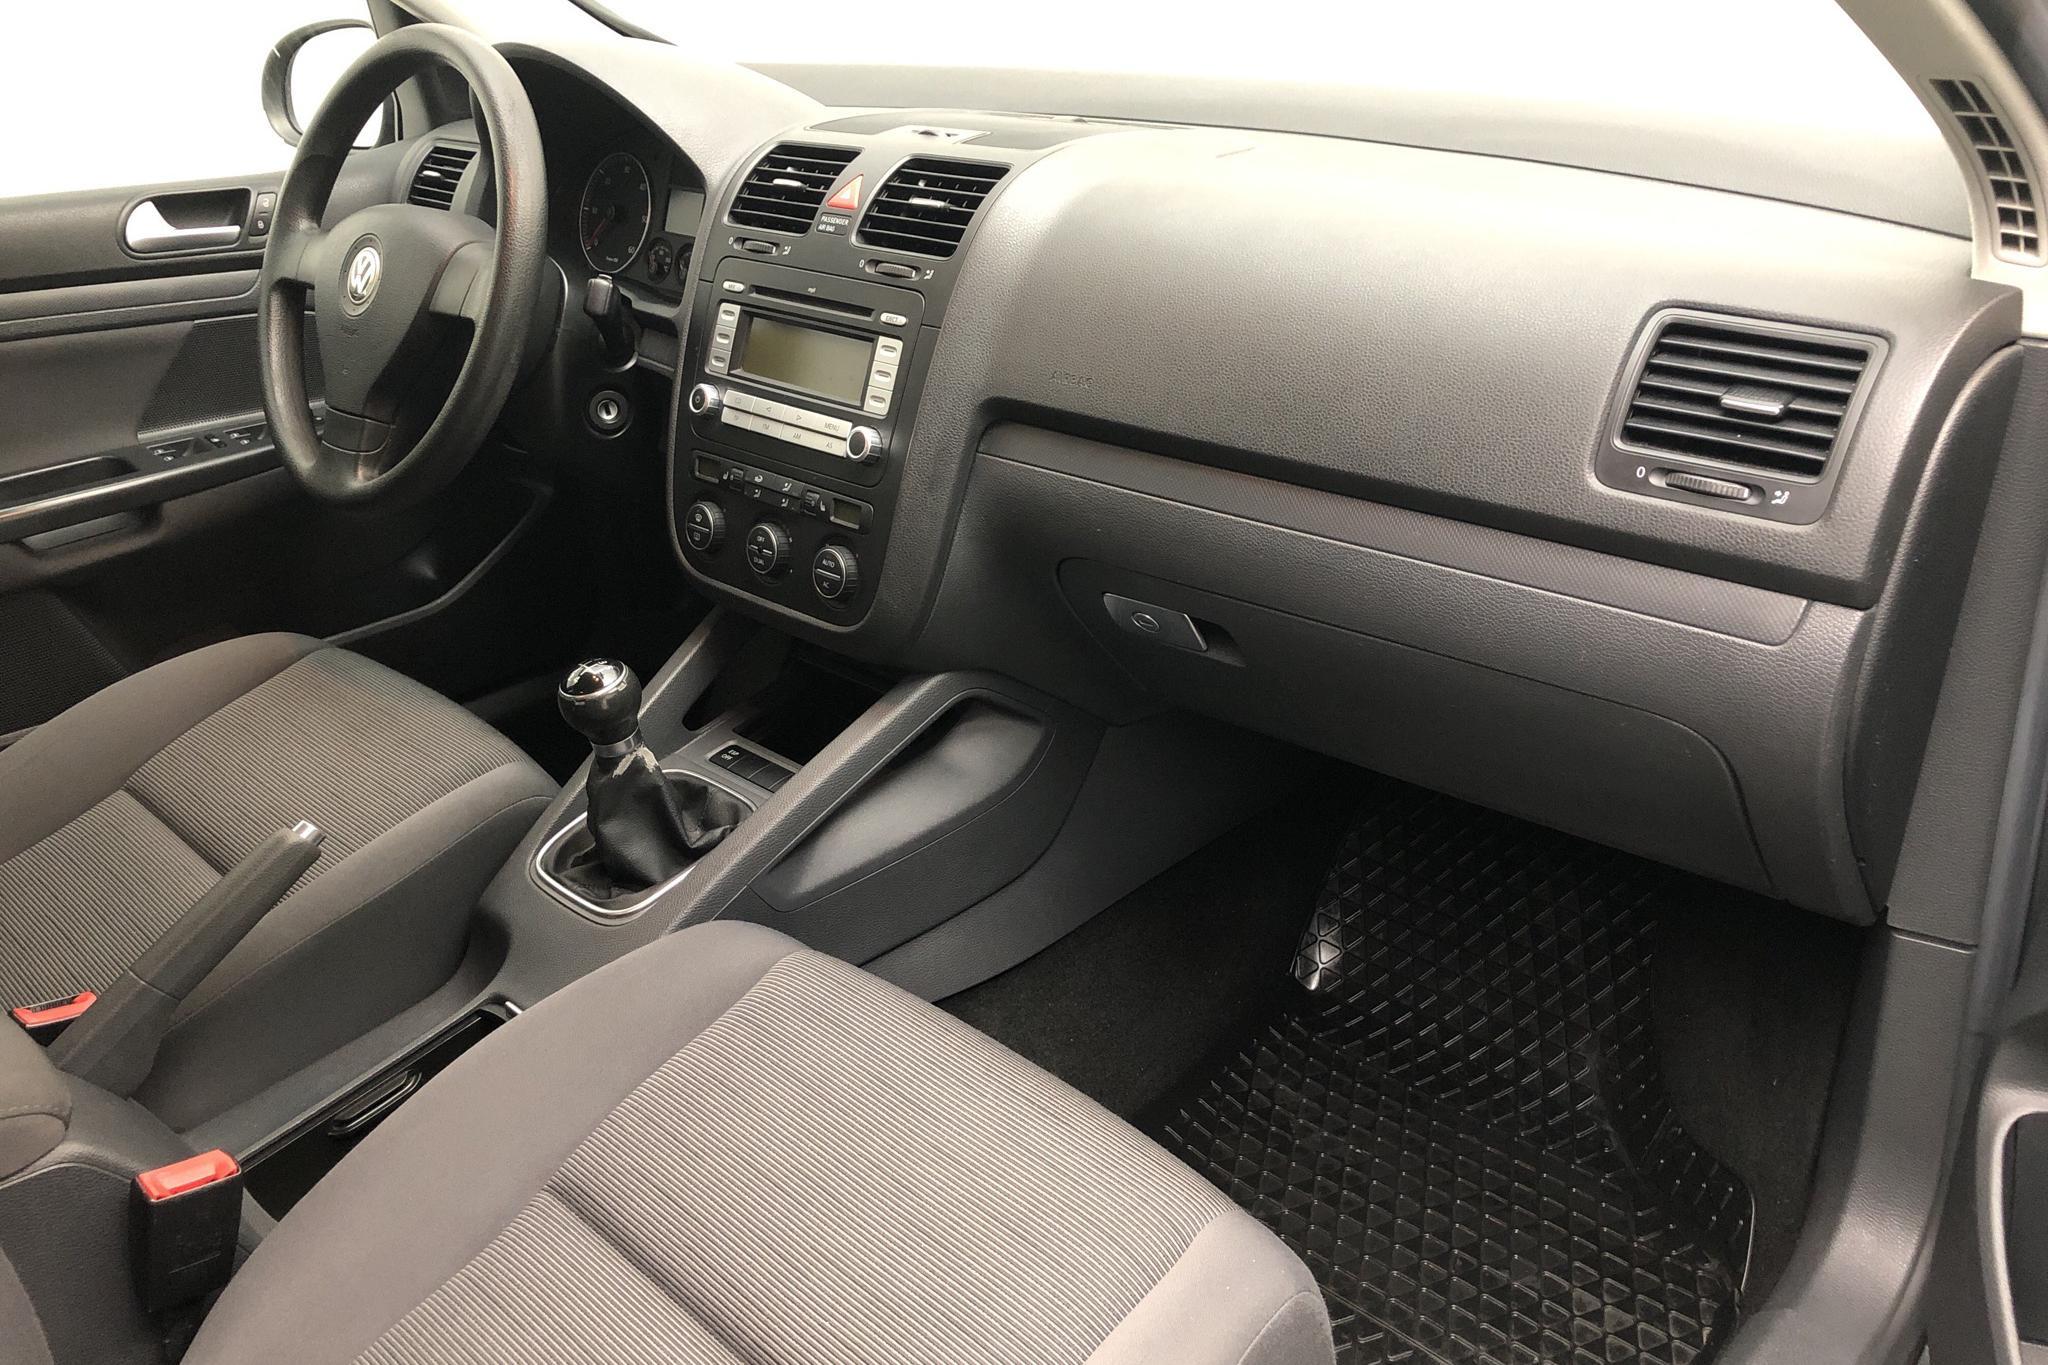 VW Golf A5 1.9 TDI 5dr (105hk) - 176 640 km - Manual - green - 2008